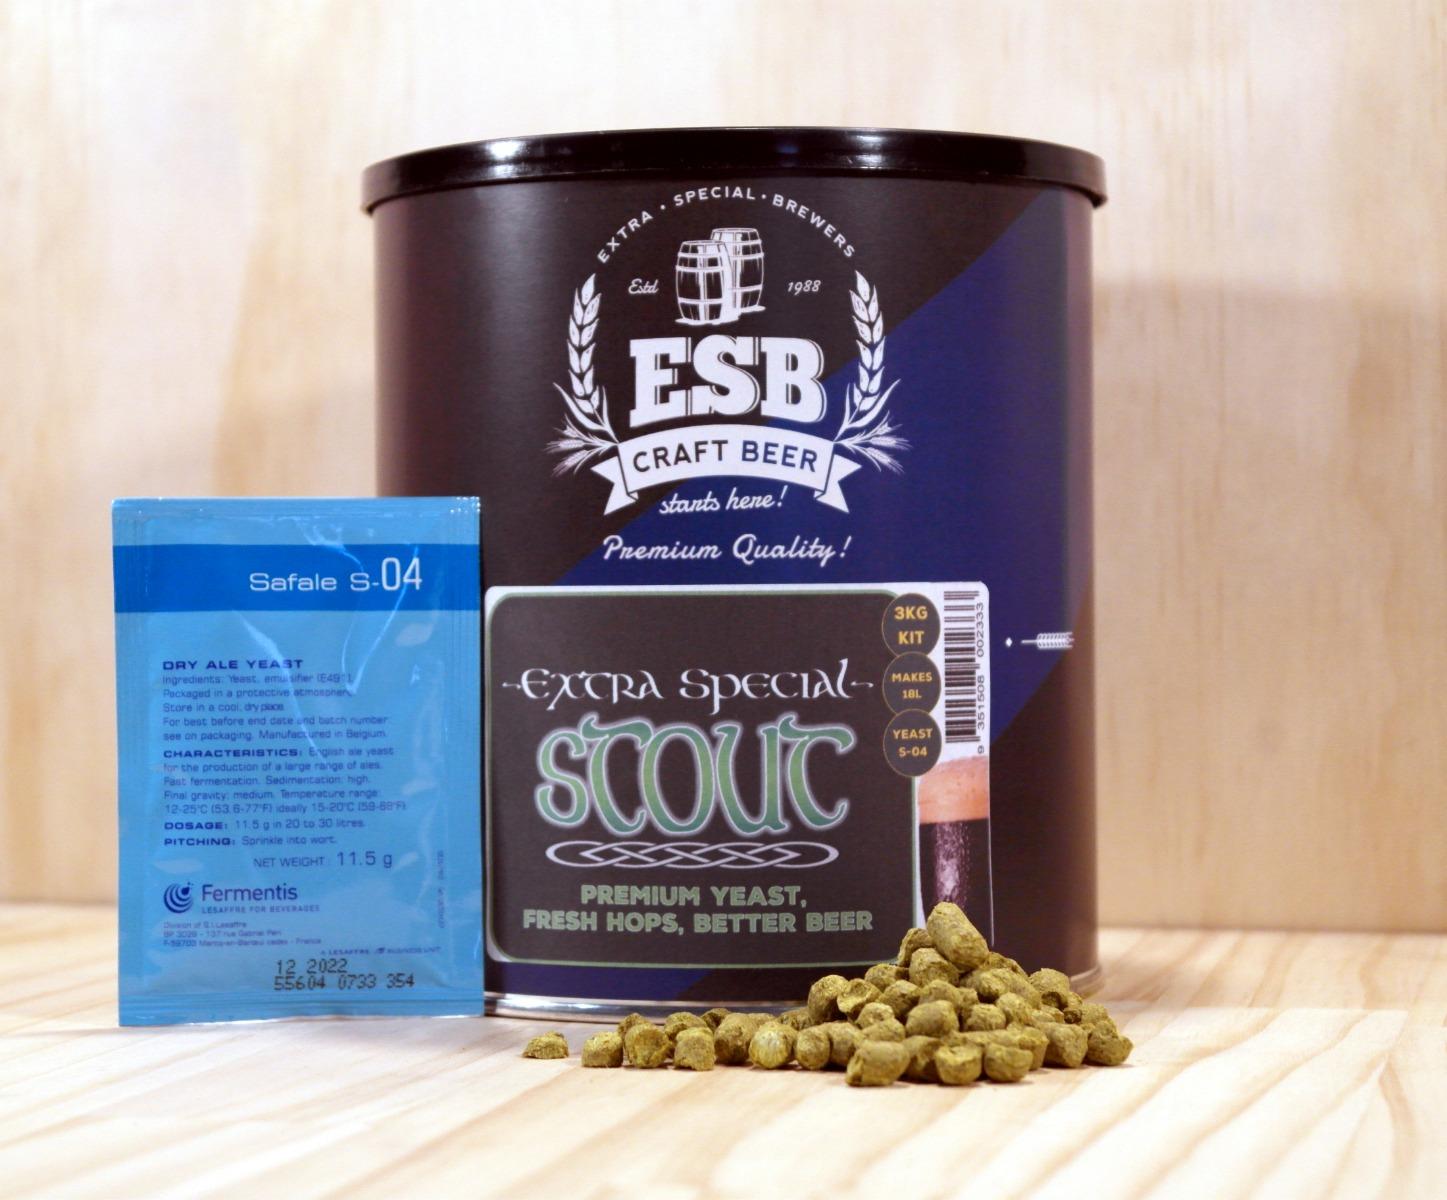 ESB 3kg Extra Special Stout